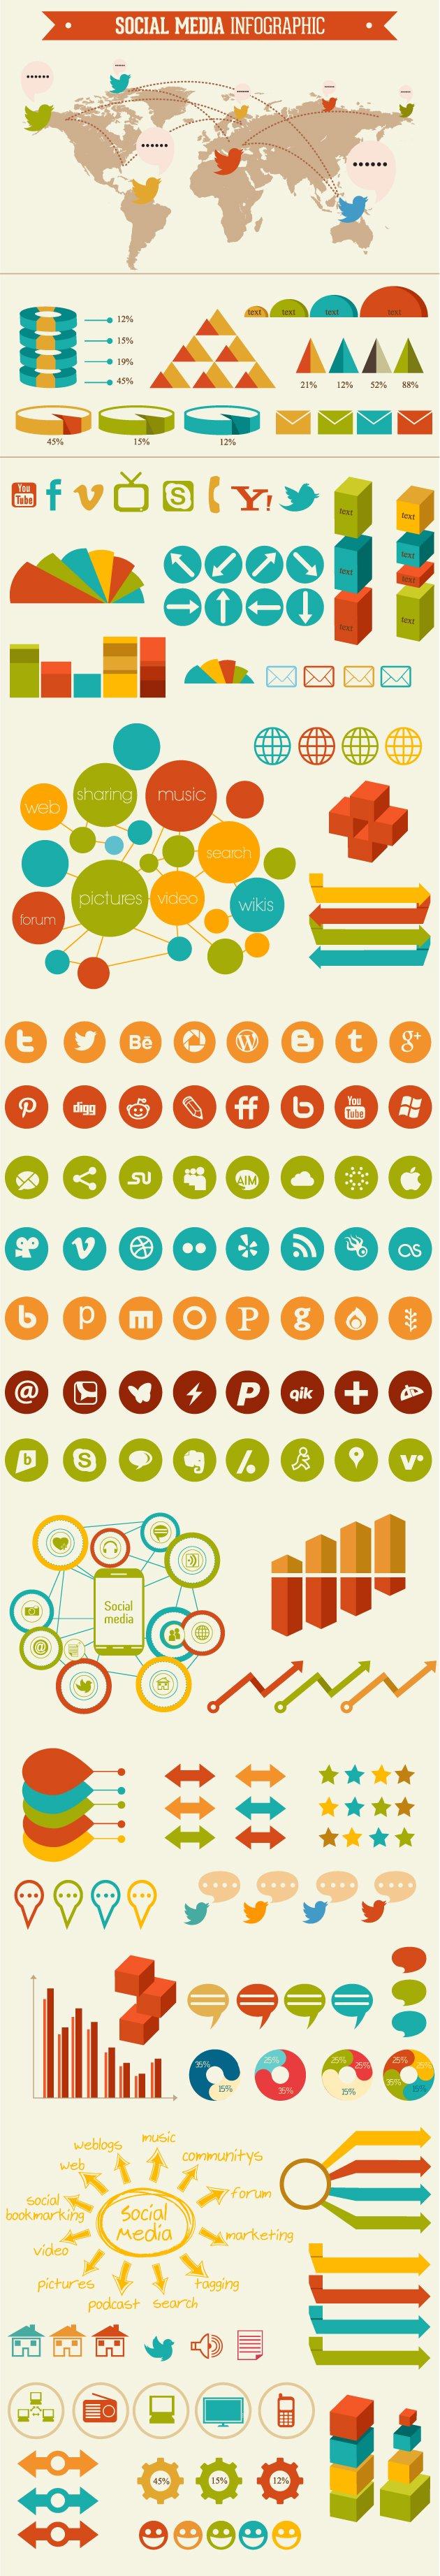 Social Media Infographic Vector 2